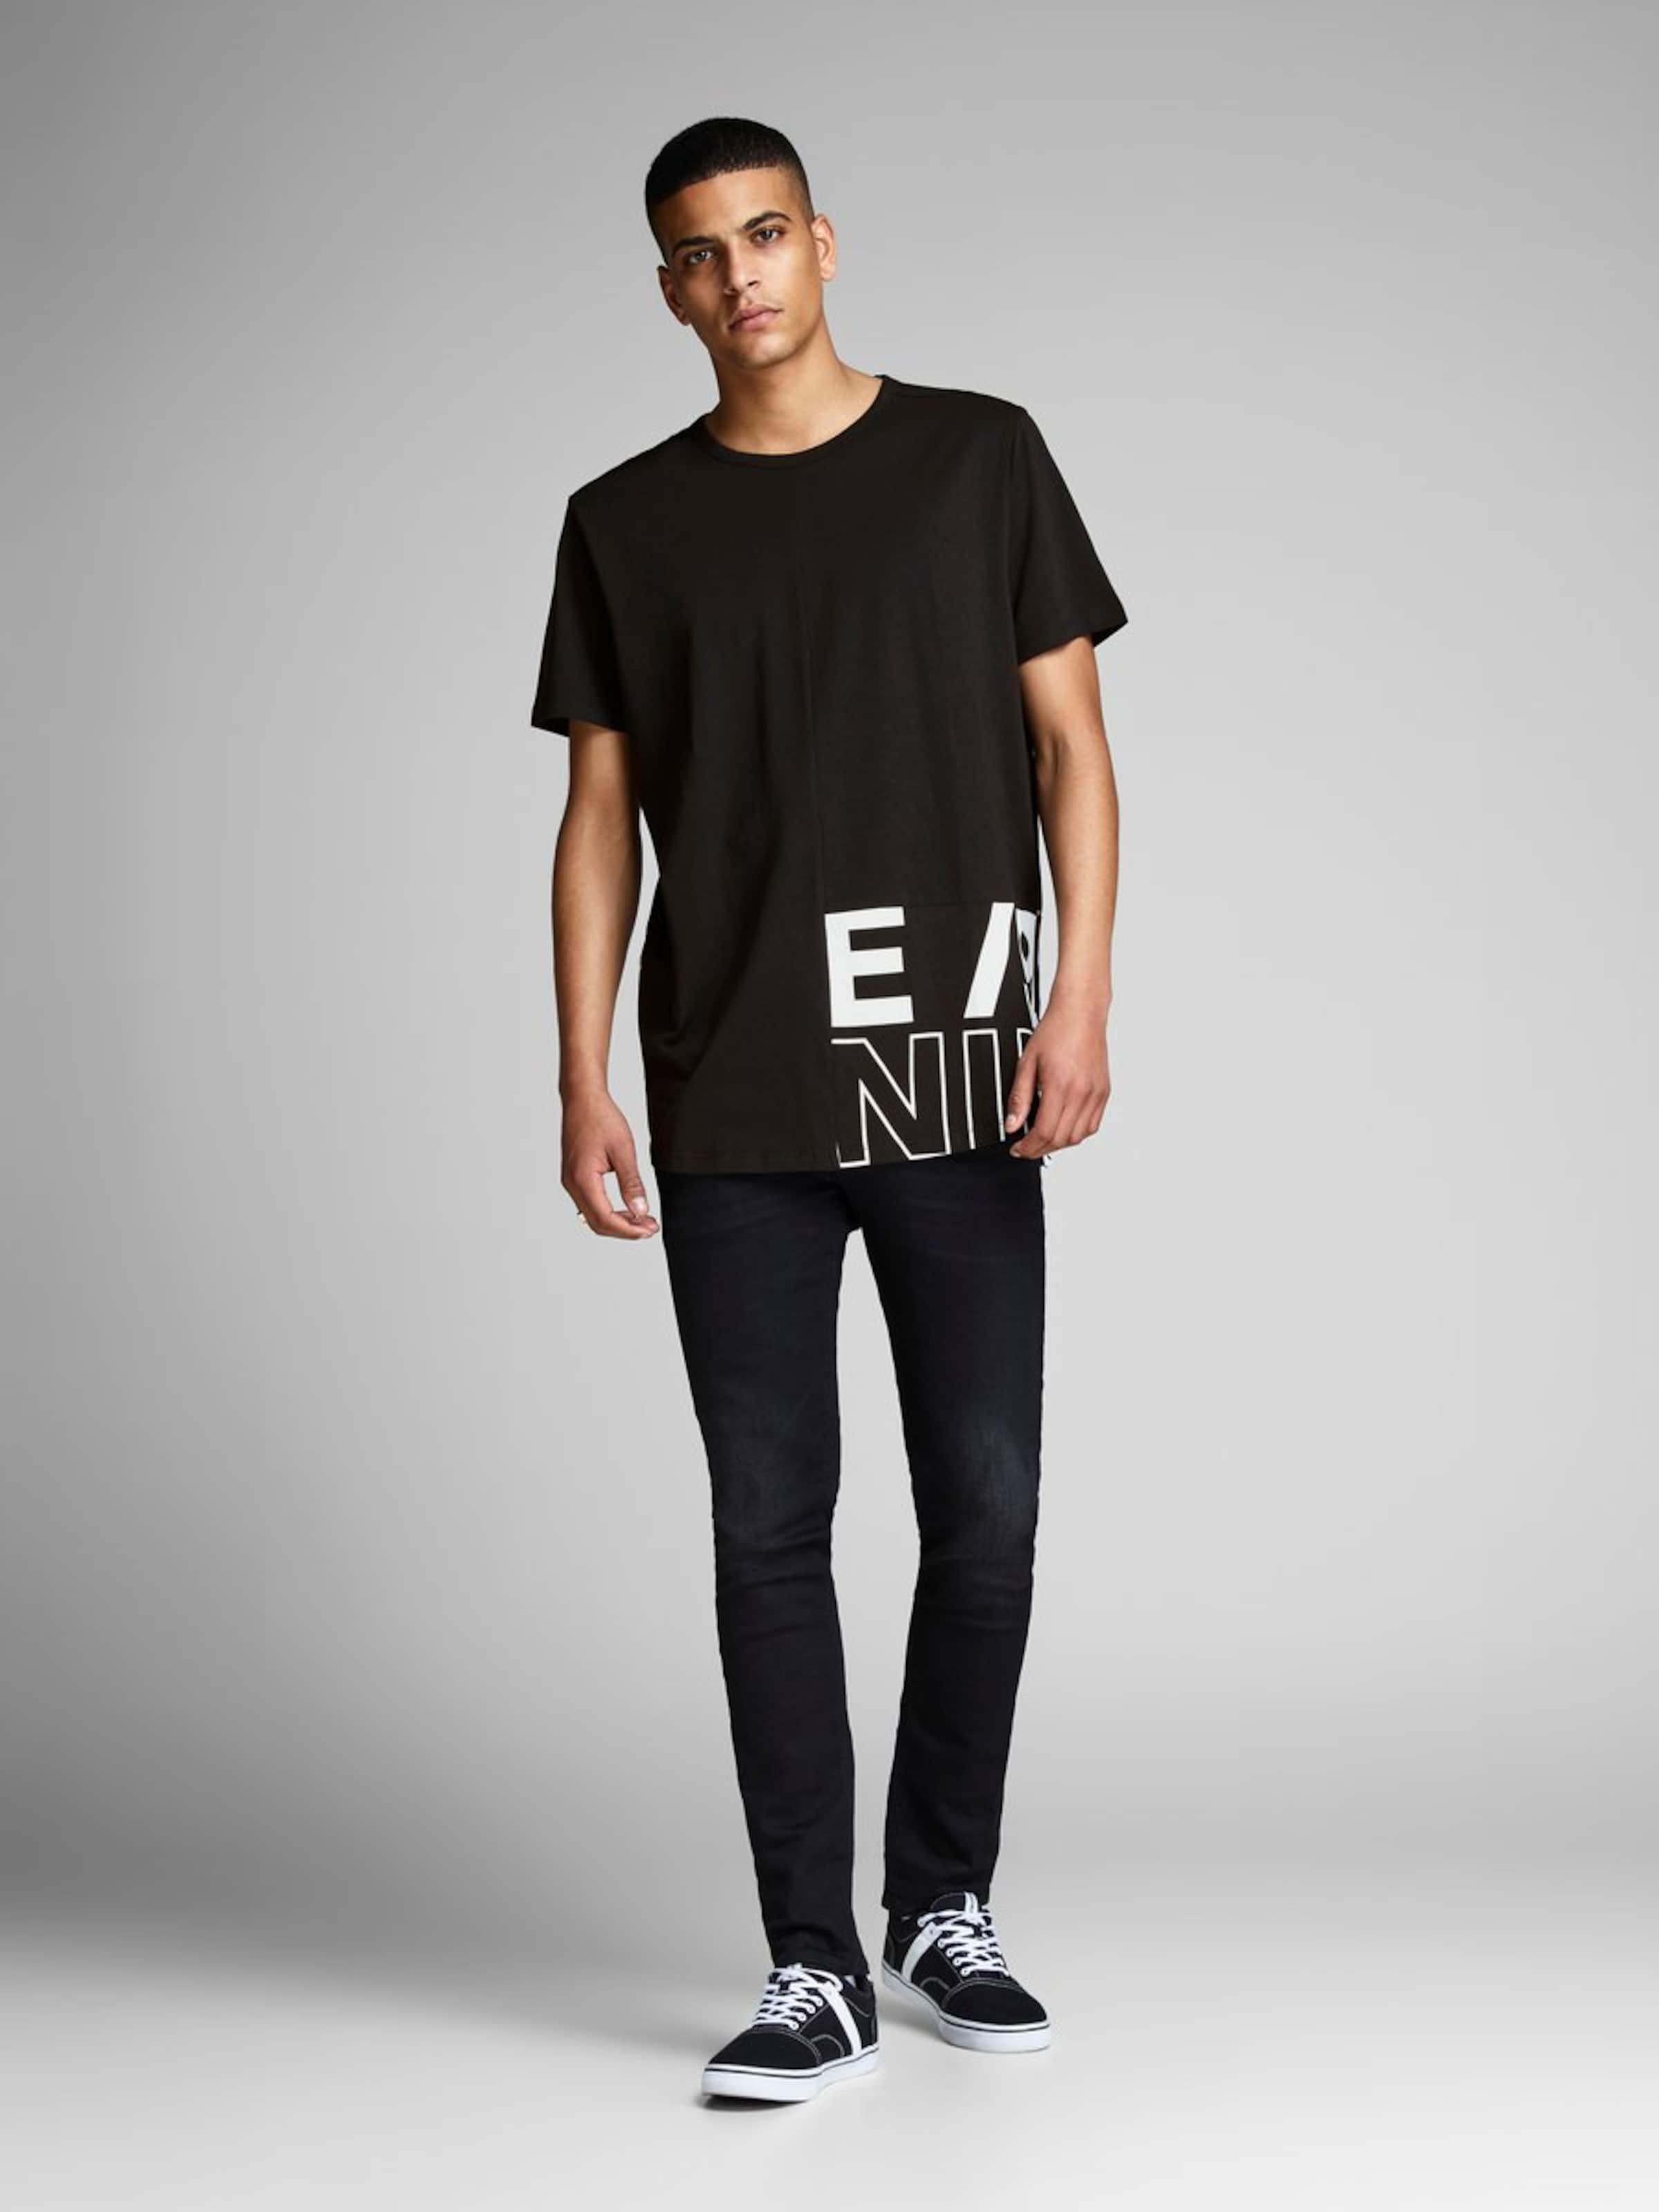 NoirBlanc Jones Jackamp; T shirt En YW2IED9eH